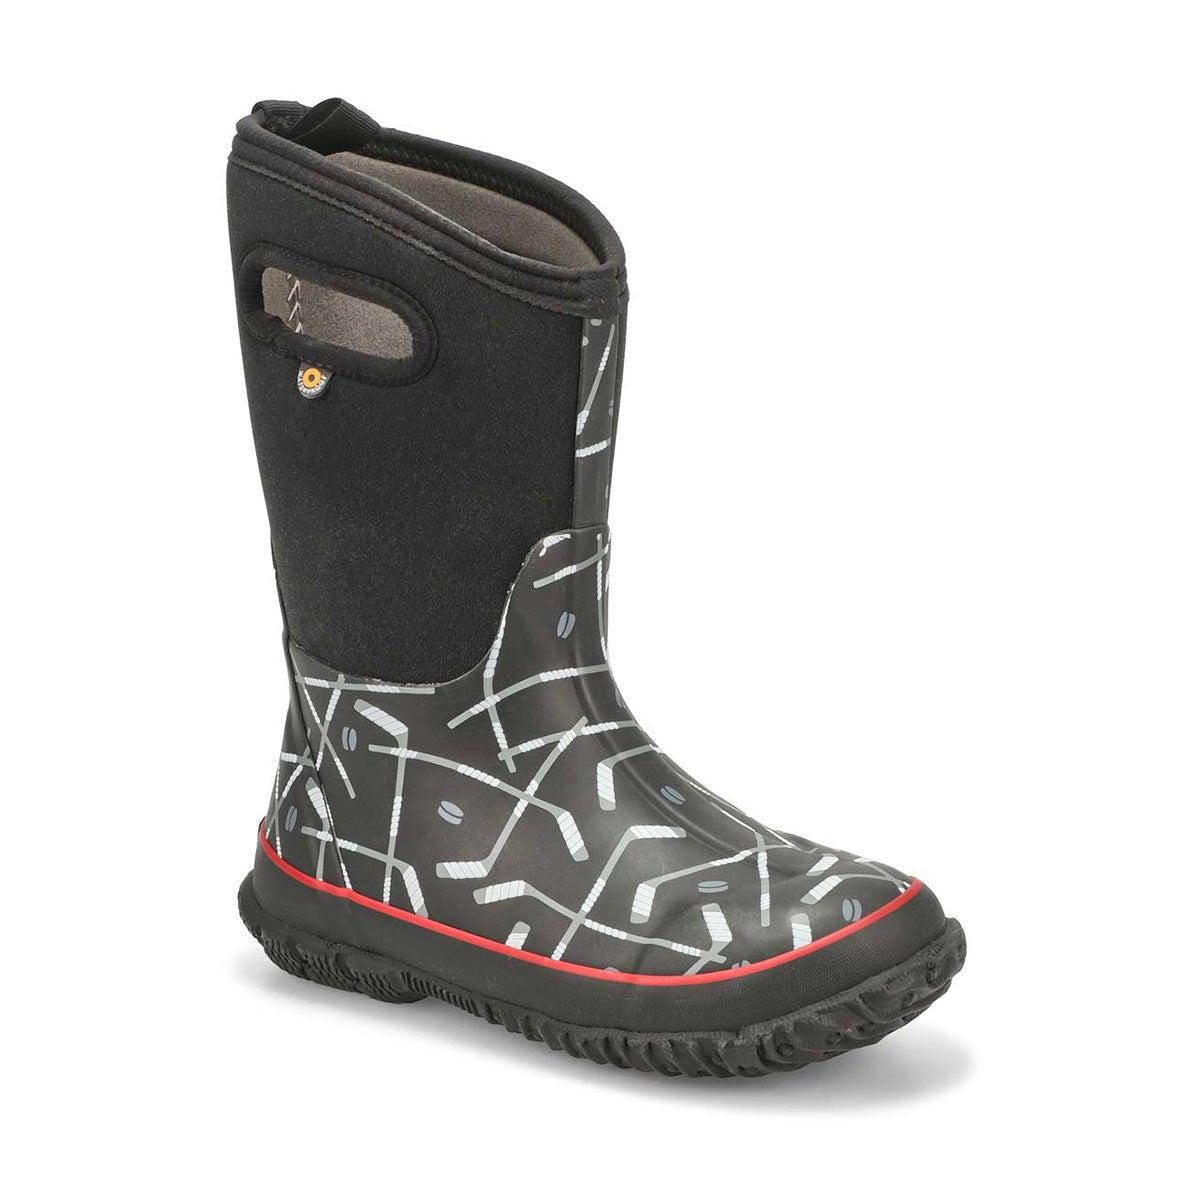 Boys' CLASSIC HOCKEY black boots